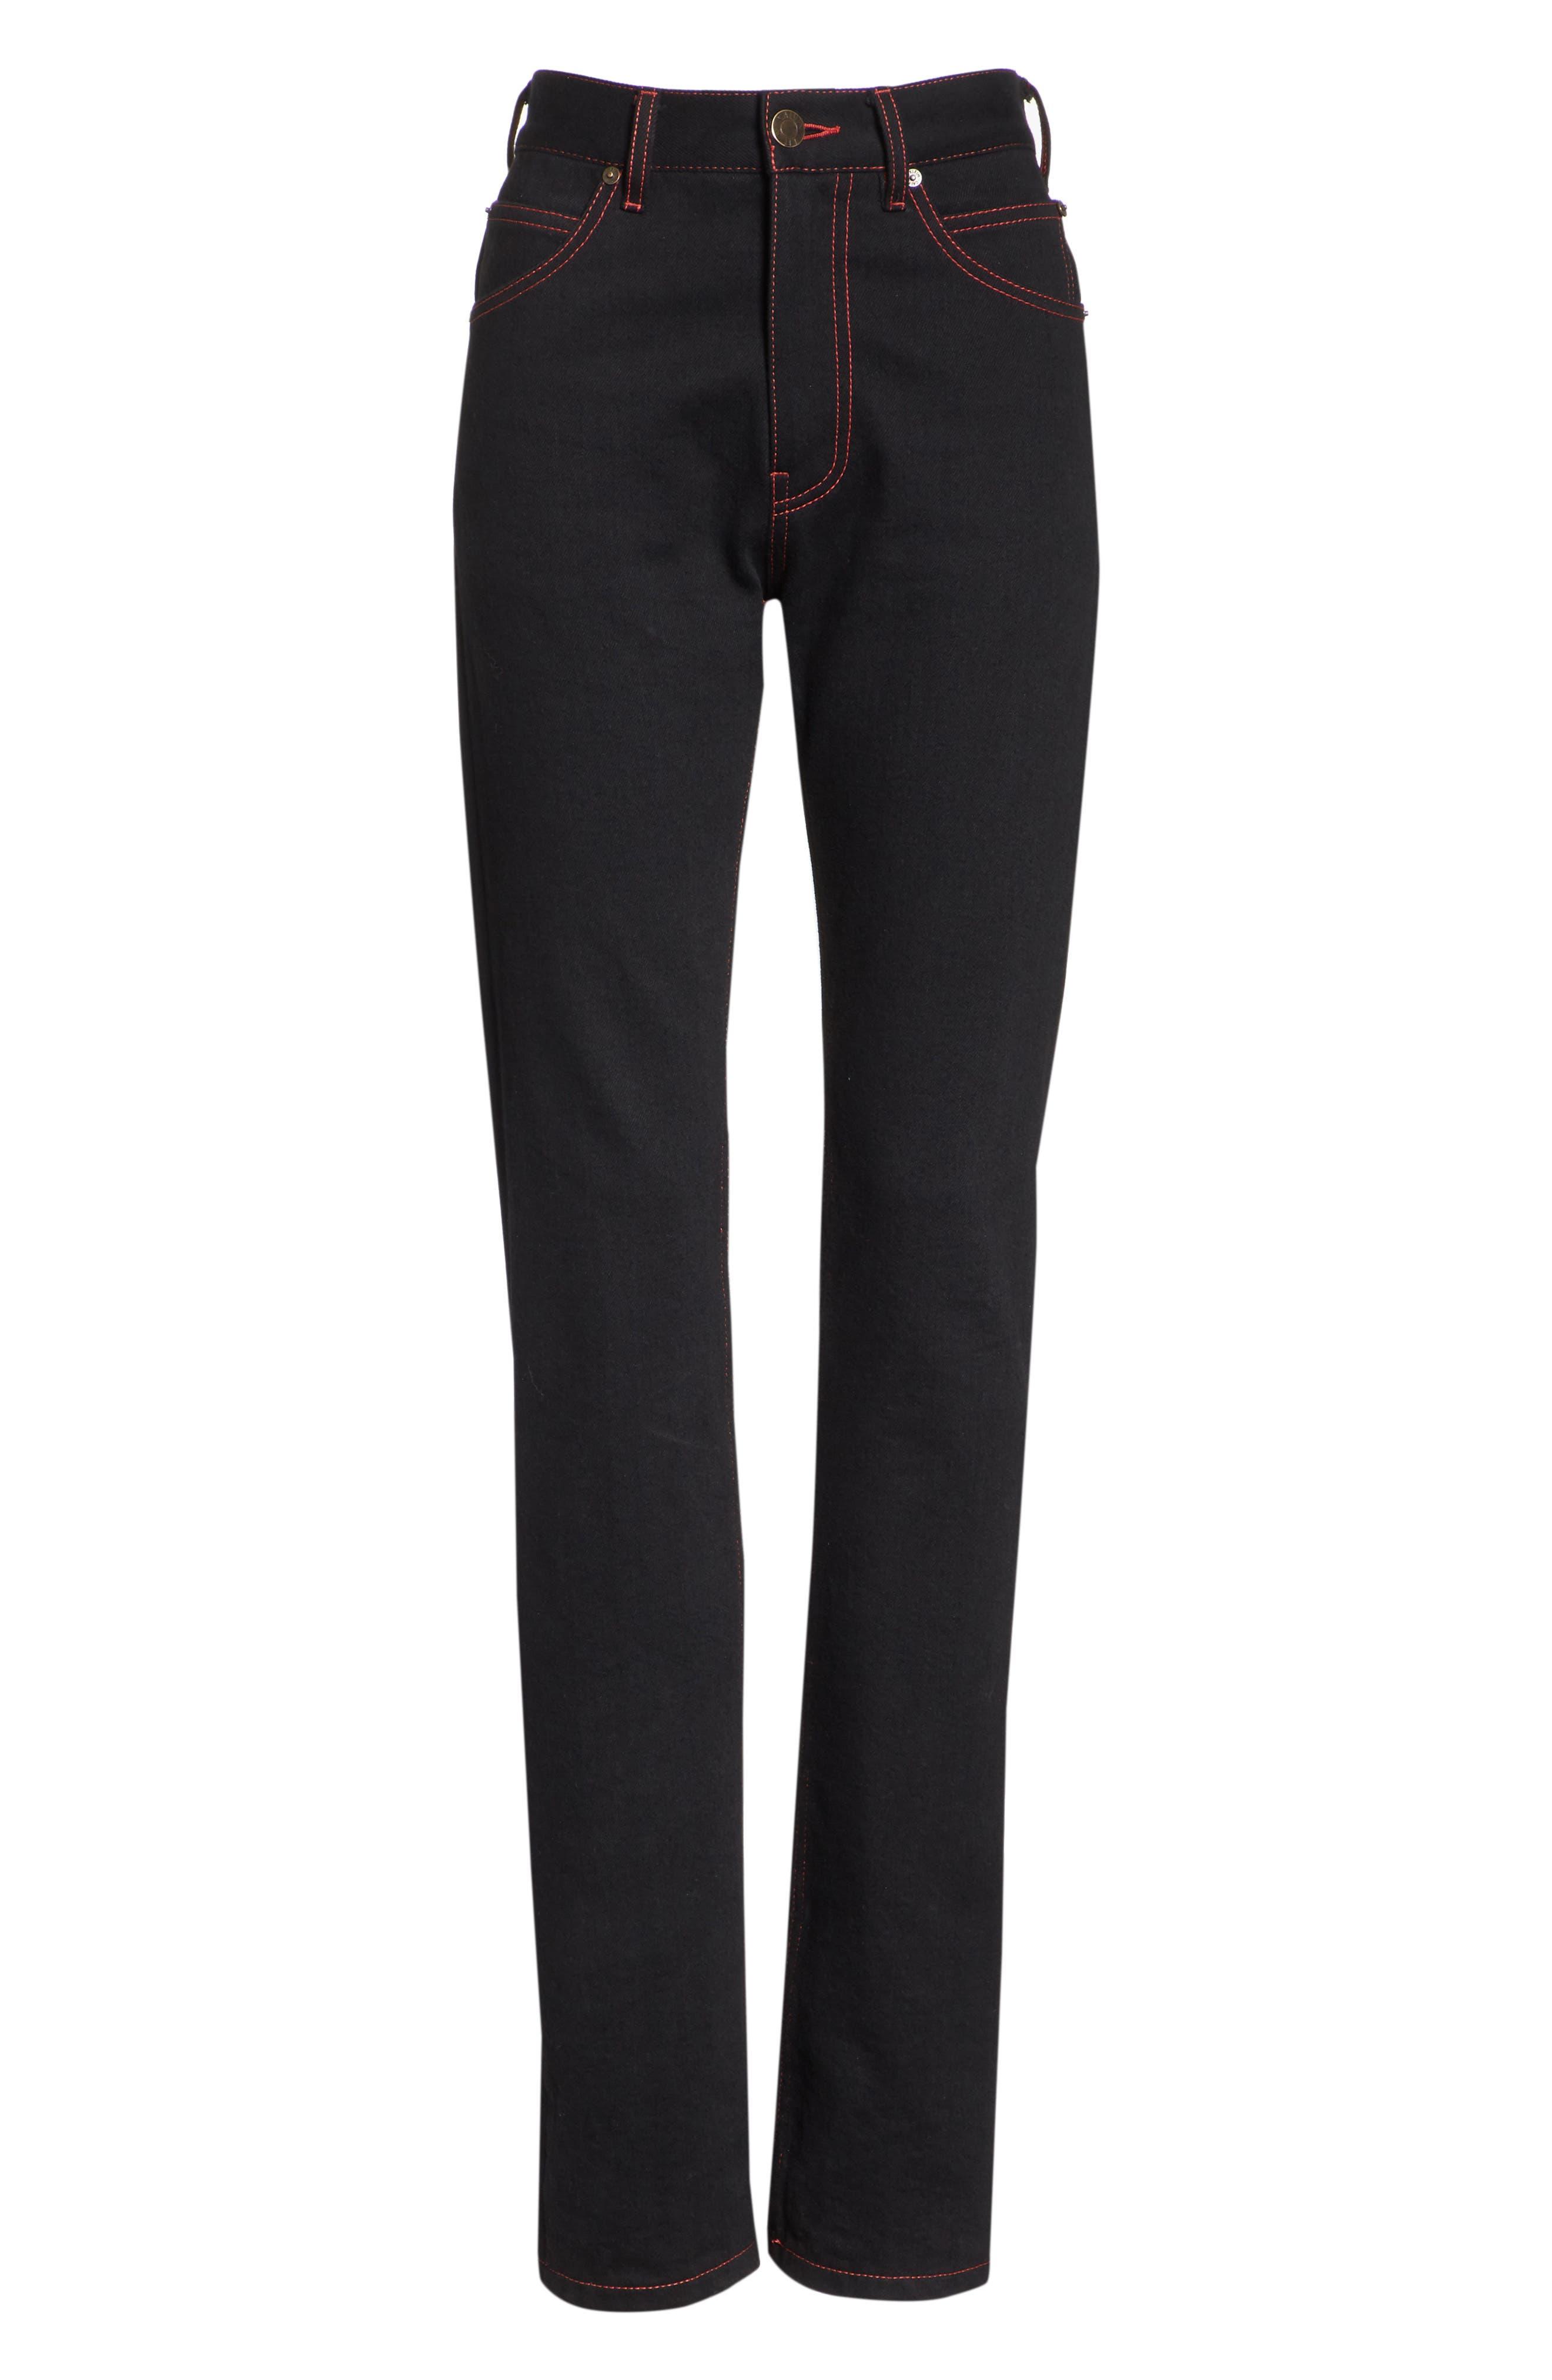 x Andy Warhol Foundation Dennis Hopper Straight Leg Jeans,                             Alternate thumbnail 6, color,                             BLACK